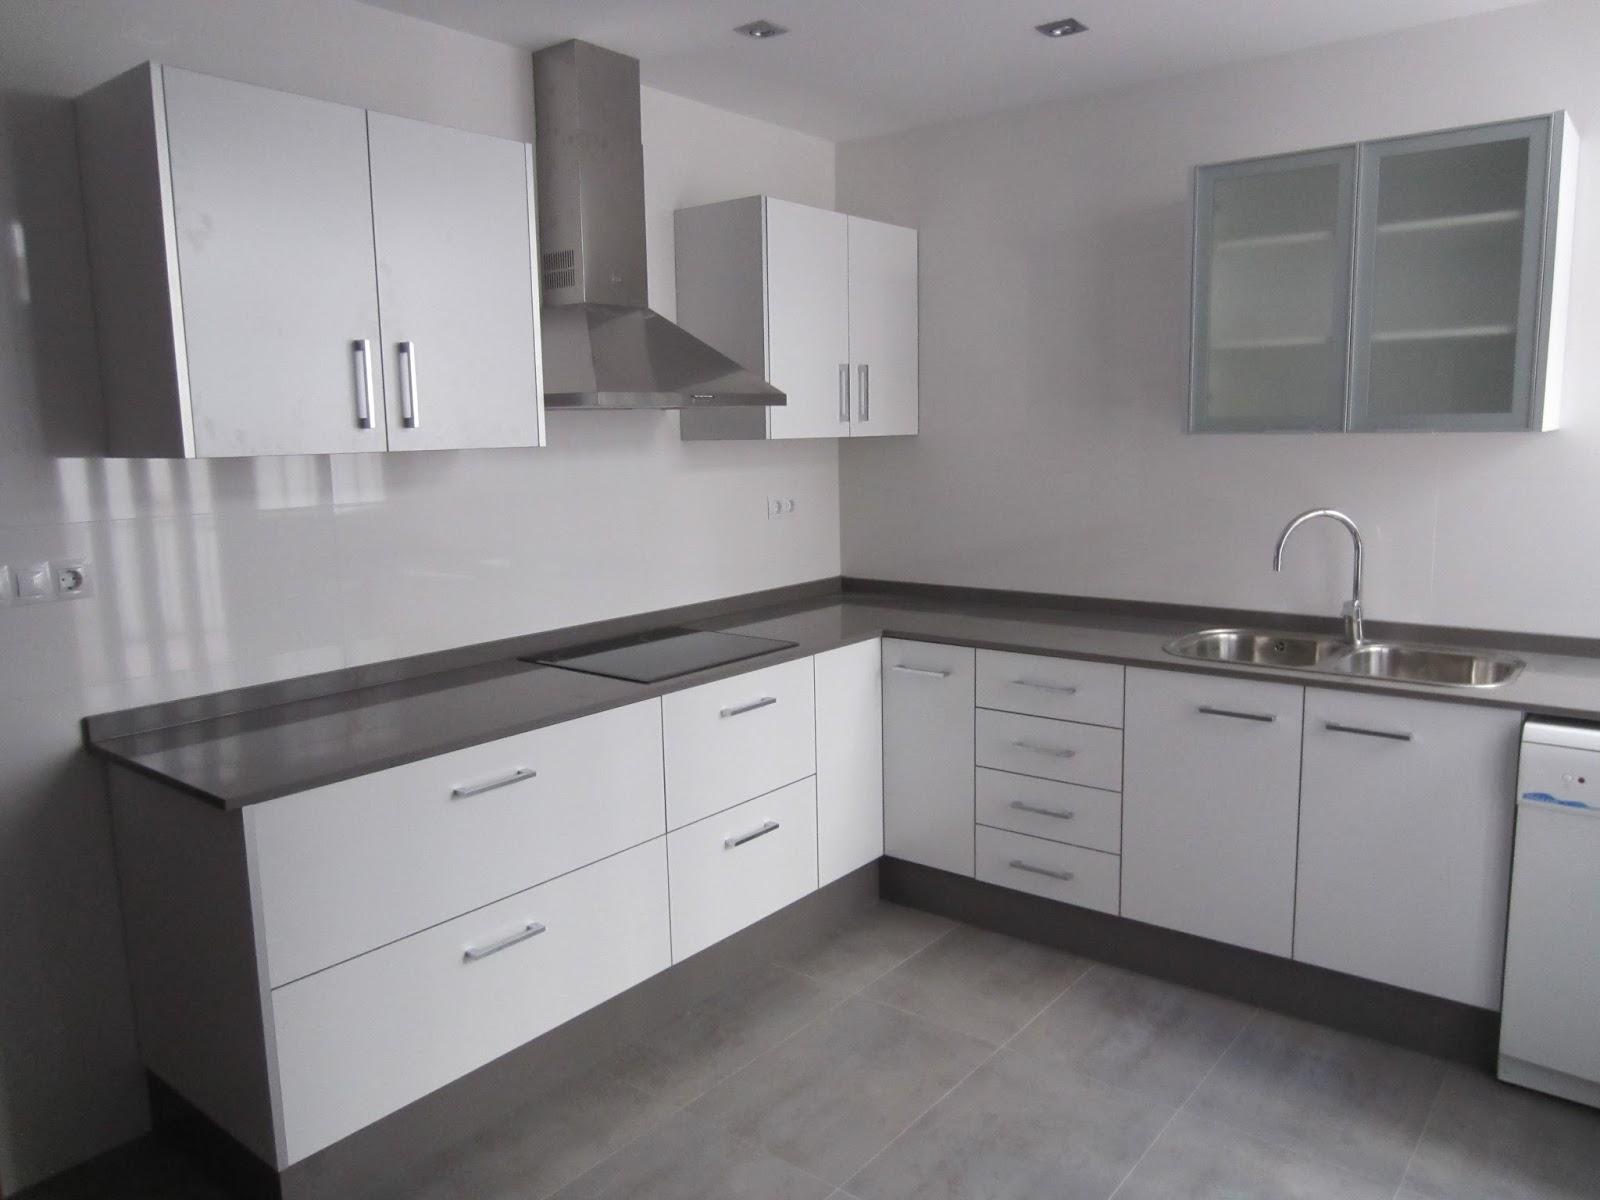 Imagenes de muebles de cocinas modernas for Muebles de cocina pequena modernos